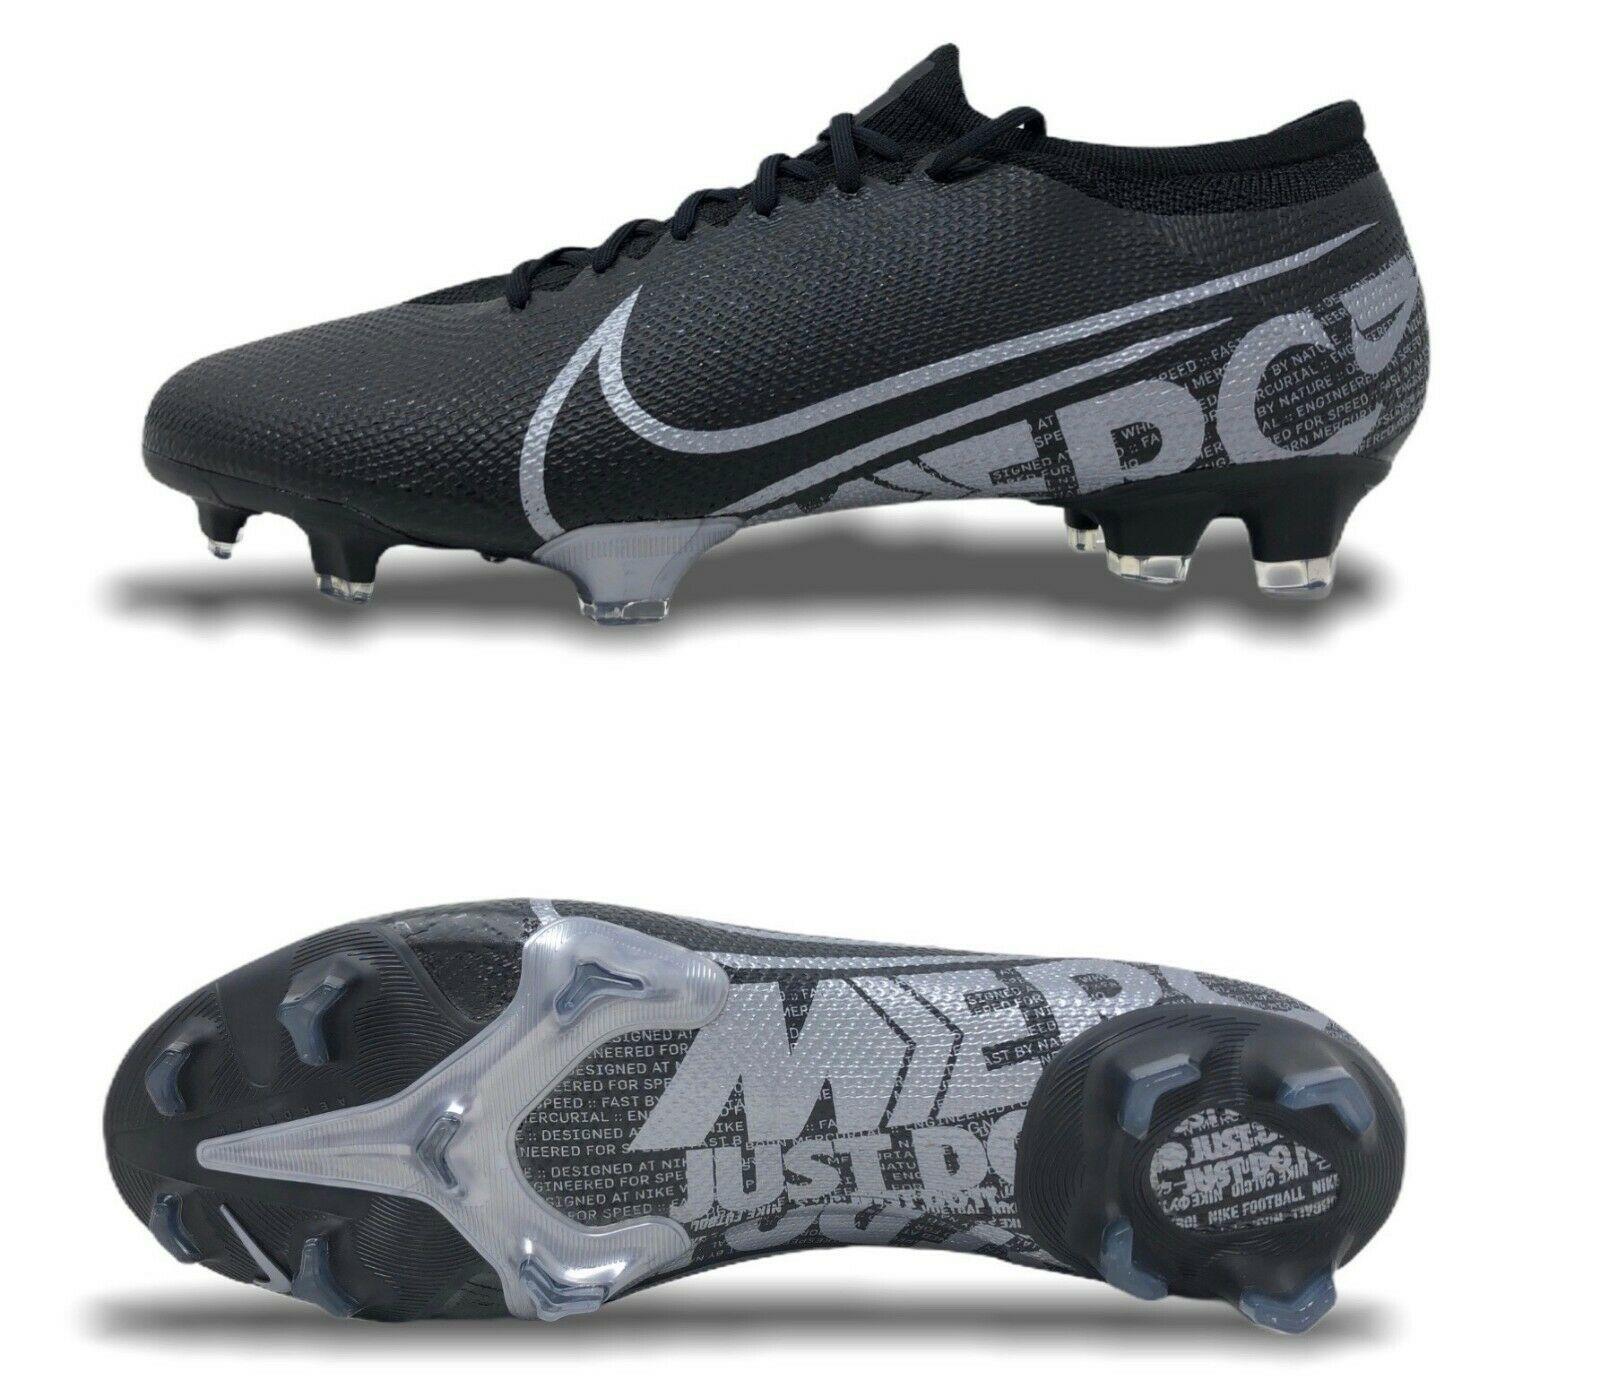 Nike Mercurial 360 Vapor 13 Pro FG Mens Soccer Cleats Size 11.5 Black AT7901-001 - $84.15